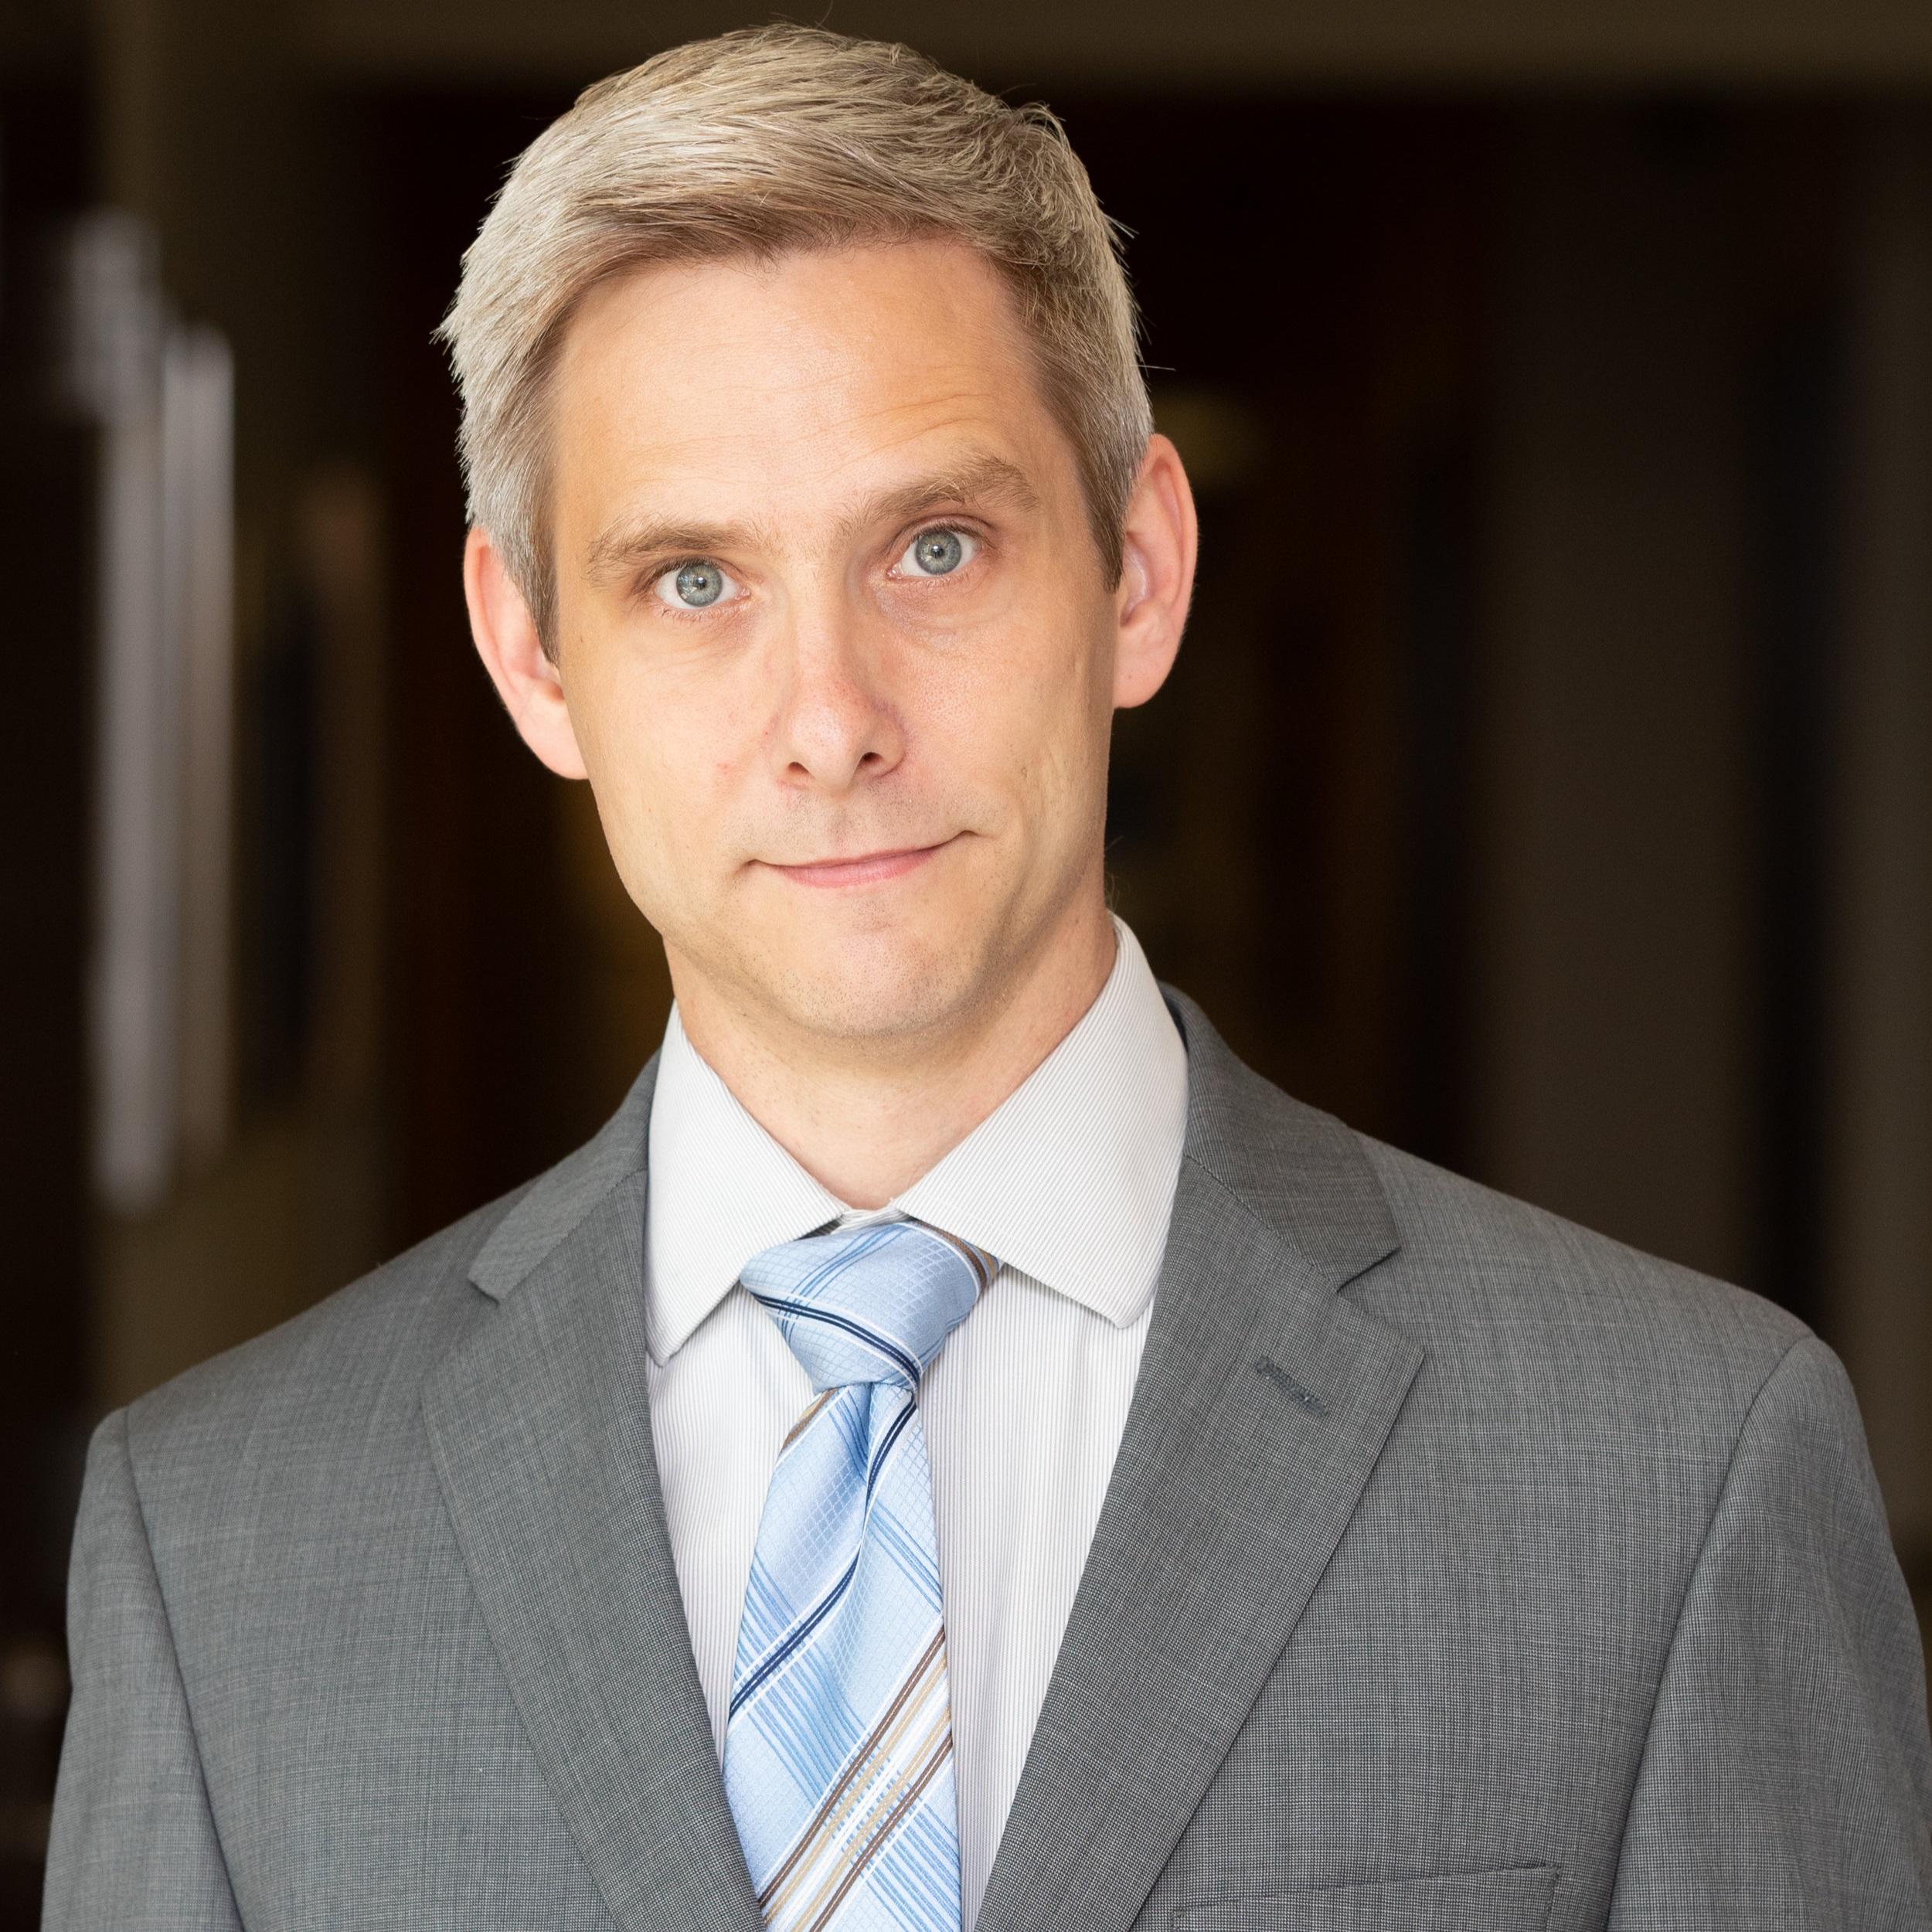 Christopher Lund, Wayne State University Law School